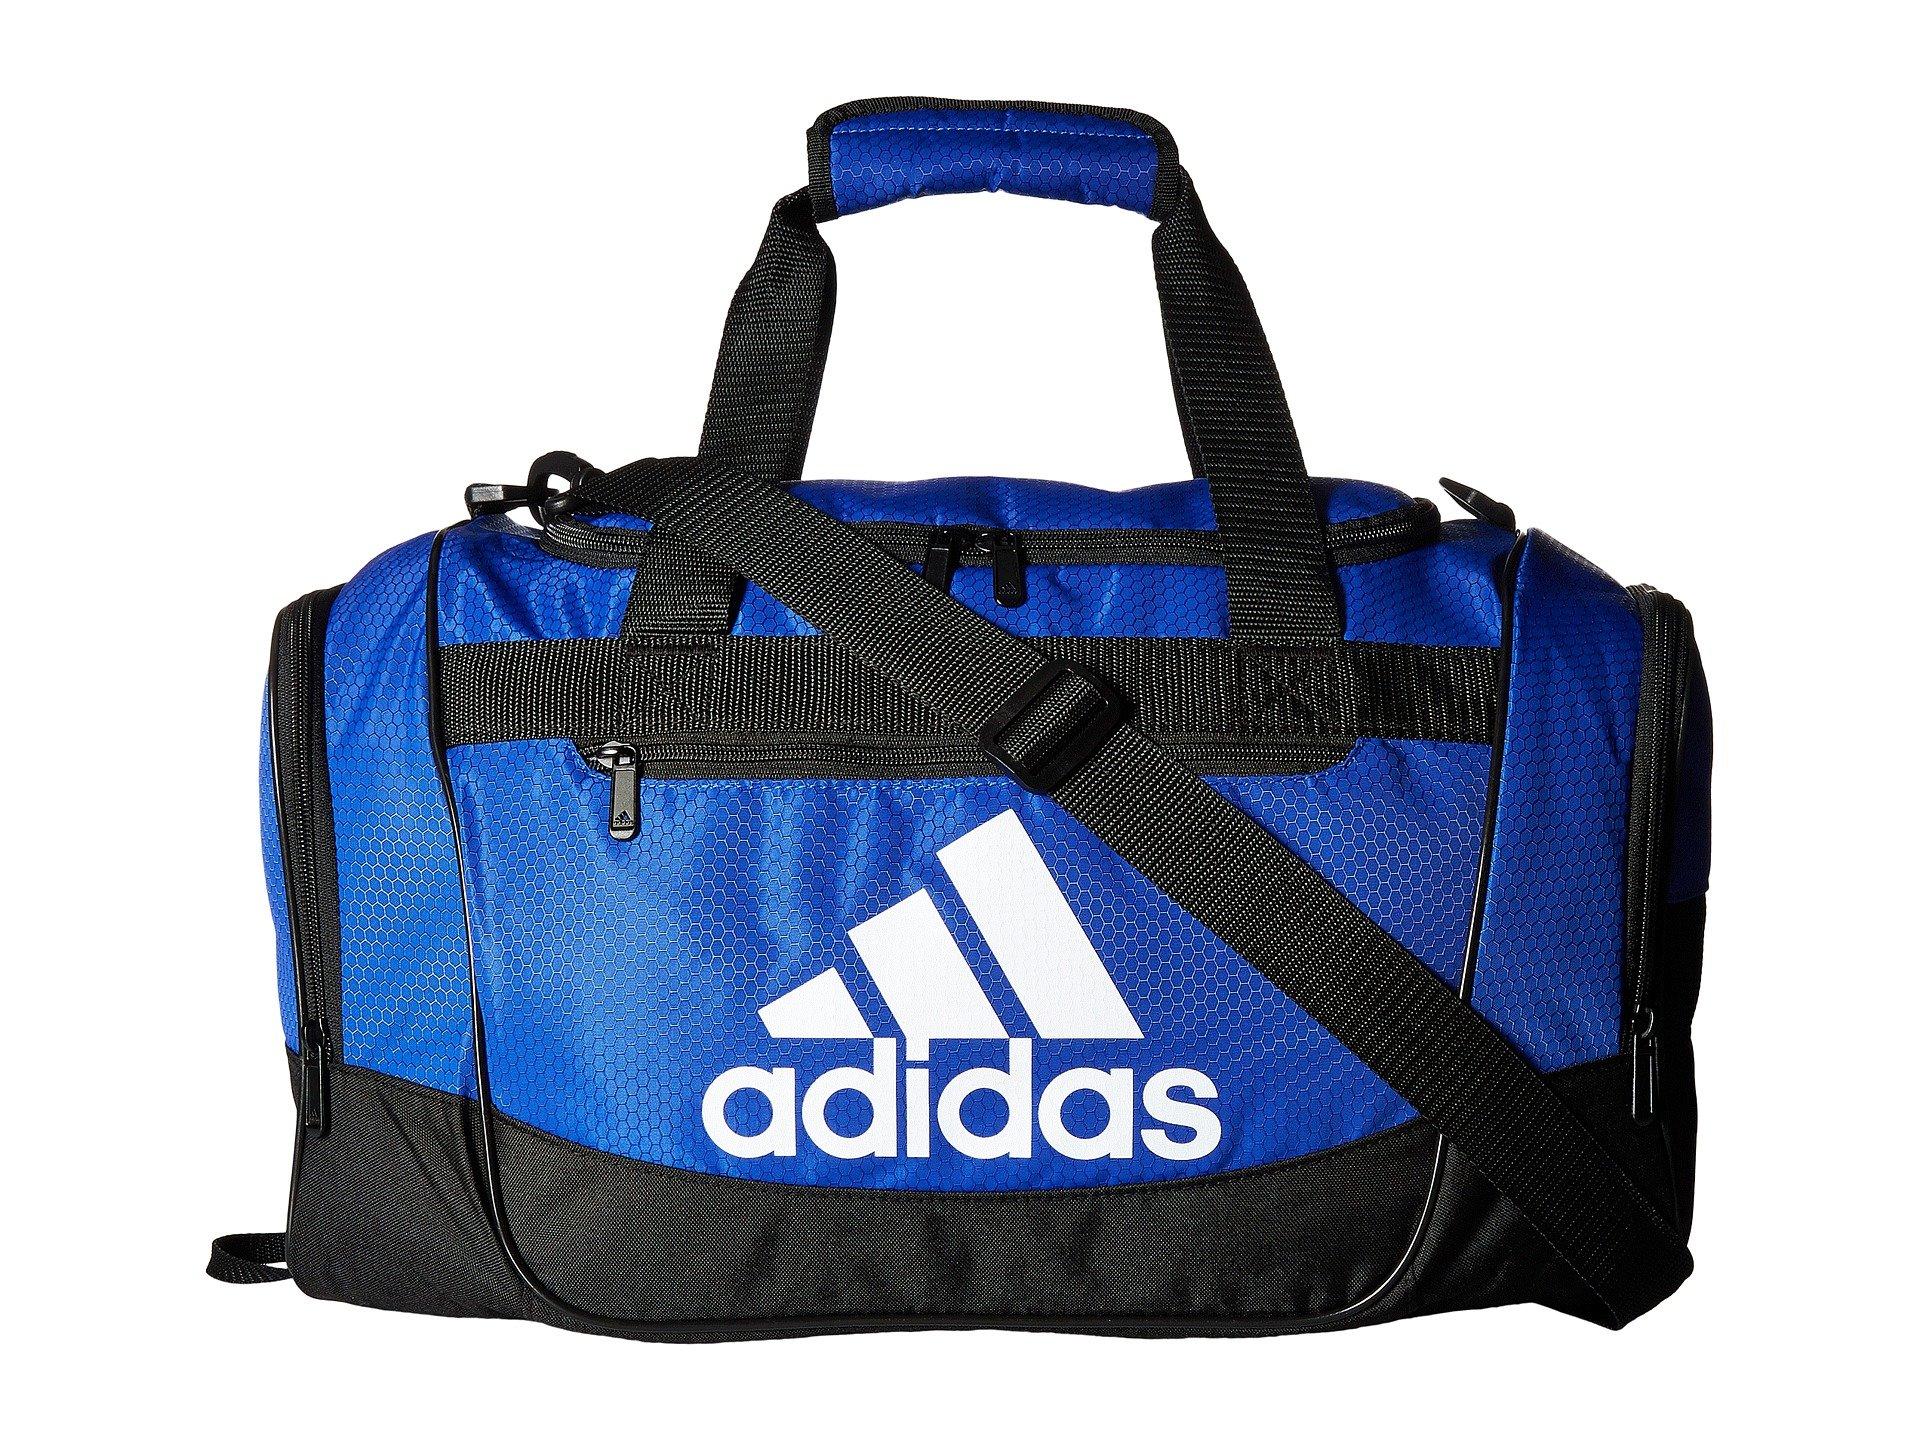 Adidas Originali Audace Difensore Iii Piccola Sacca, Audace Originali Modesens Blu 91ecde